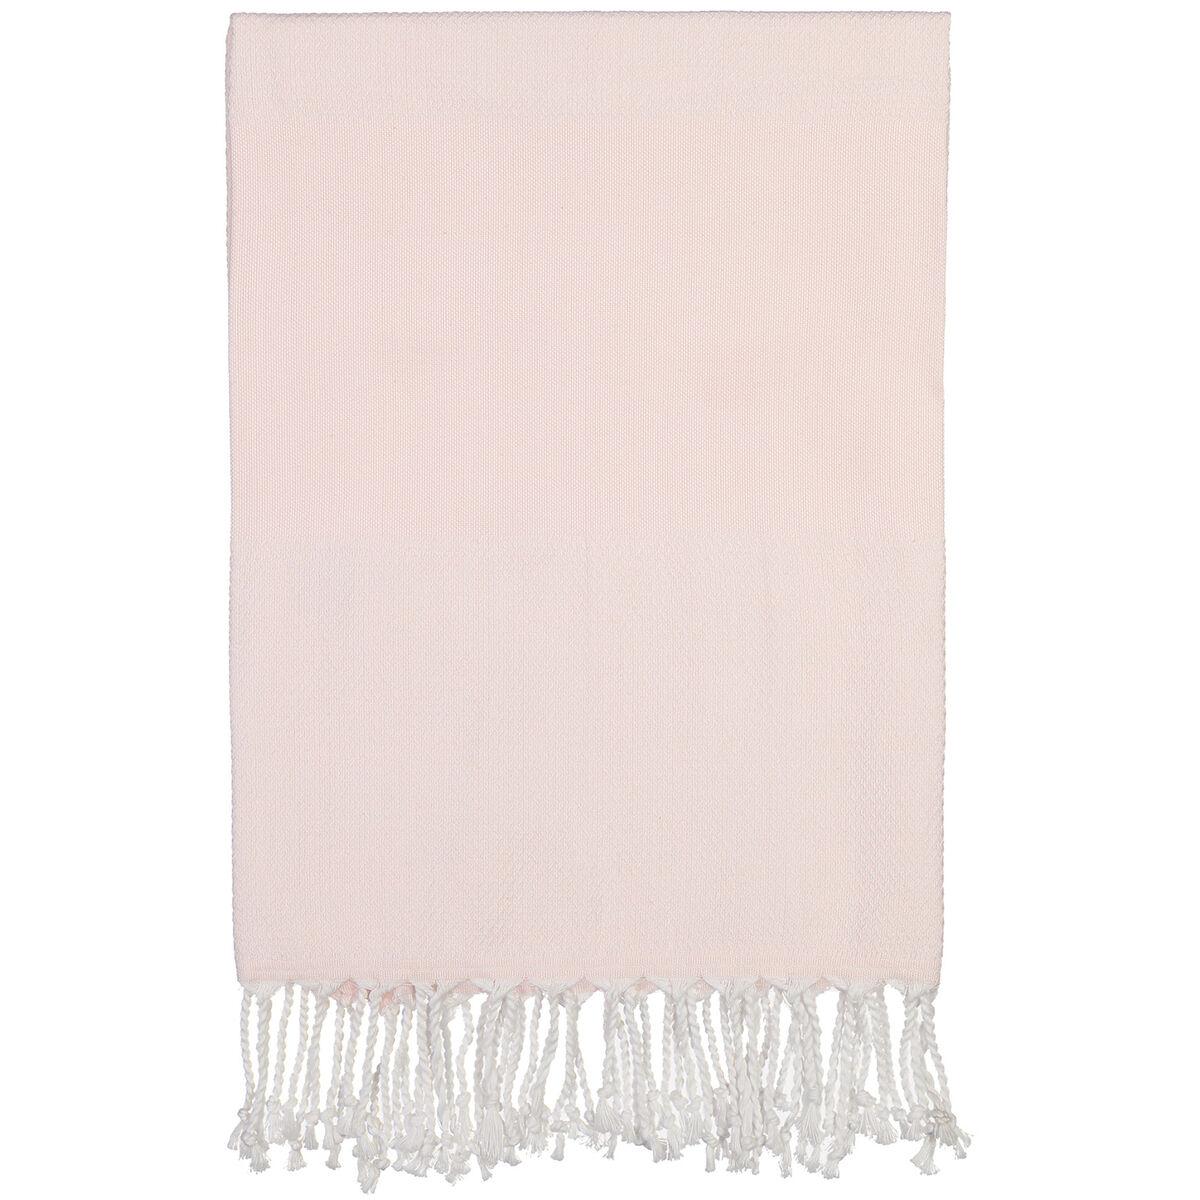 Langø Puuvillapyyhe 100 x 170 cm, vaaleanpunainen